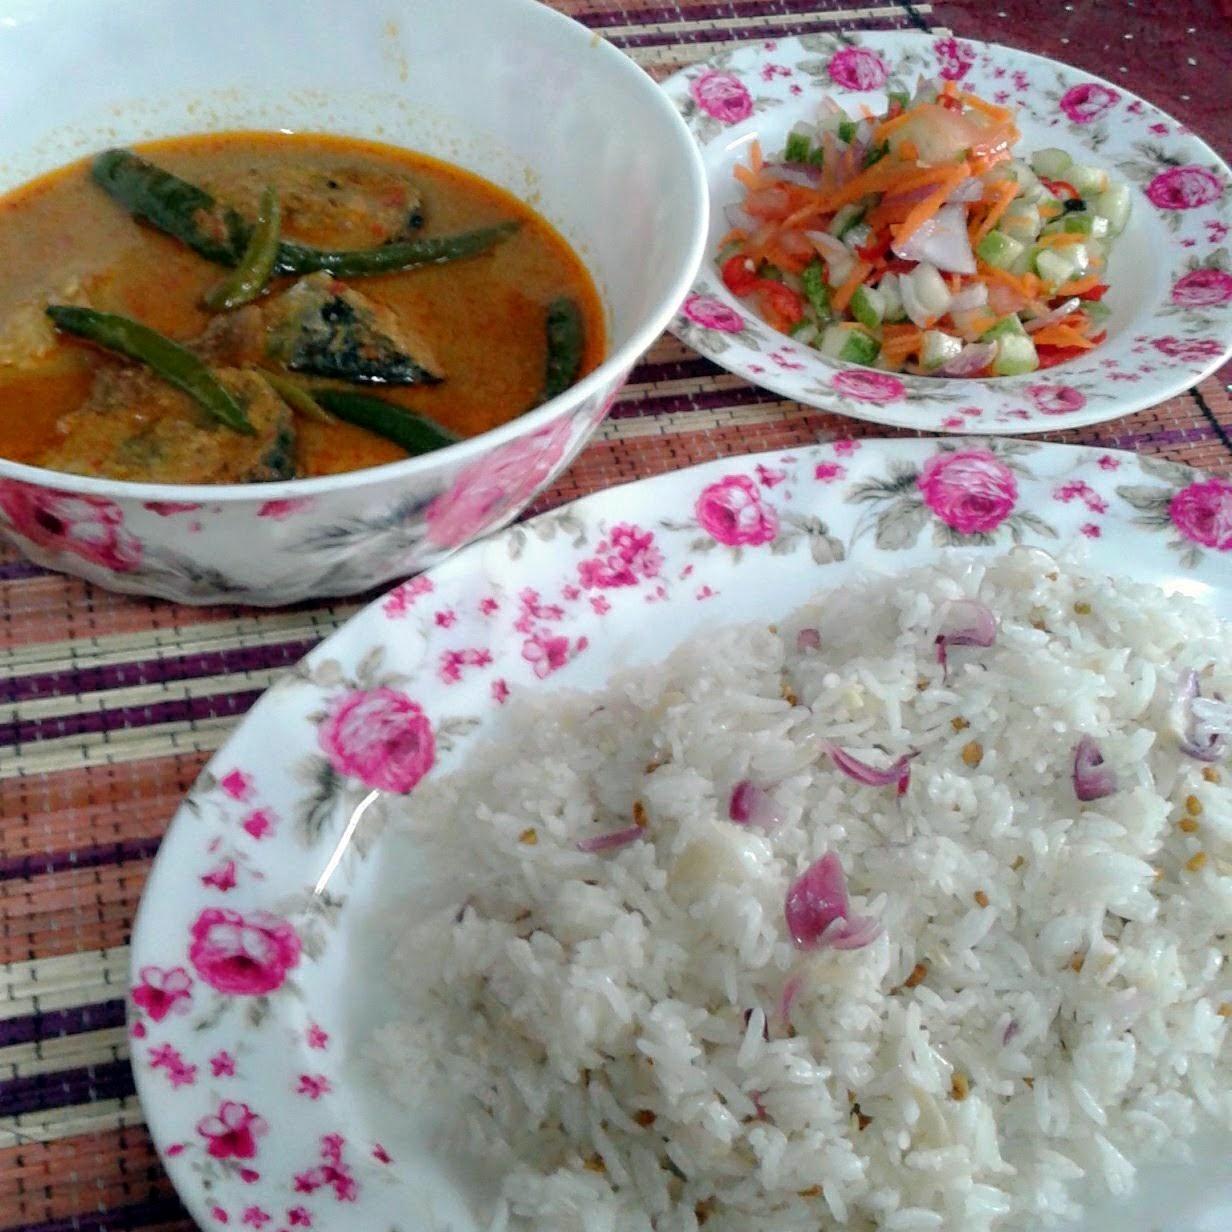 Cara masak Nasi dagang, bahan-bahan nasi dagang, petua nasi dagang sedap, resepi nasi dagang,nasi dagang asli, nasi dagang terangganu, nasi dagang kelantan,keistimewaan pantai timur, beras wangi,kukus nasi dagang,beras nasi dagang